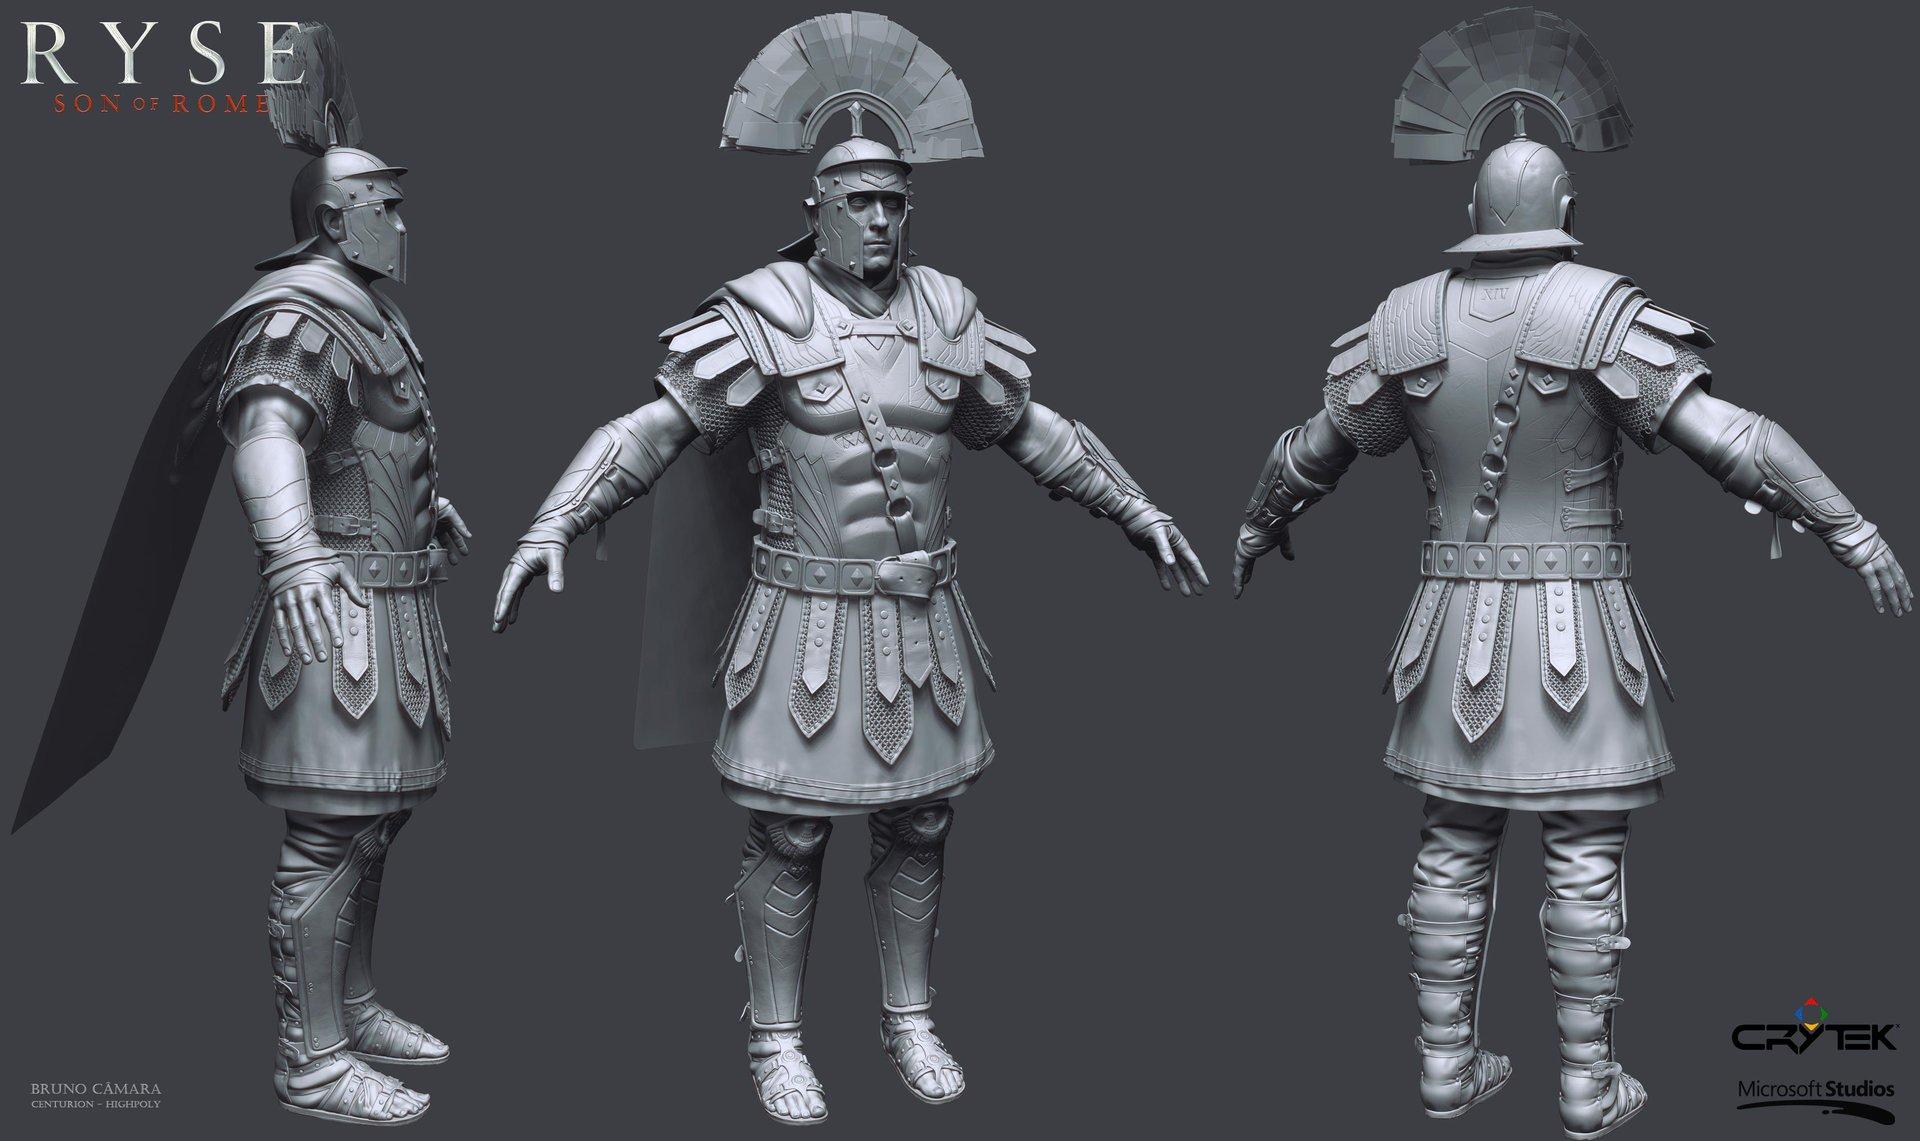 Bruno camara centurion high brunocamara